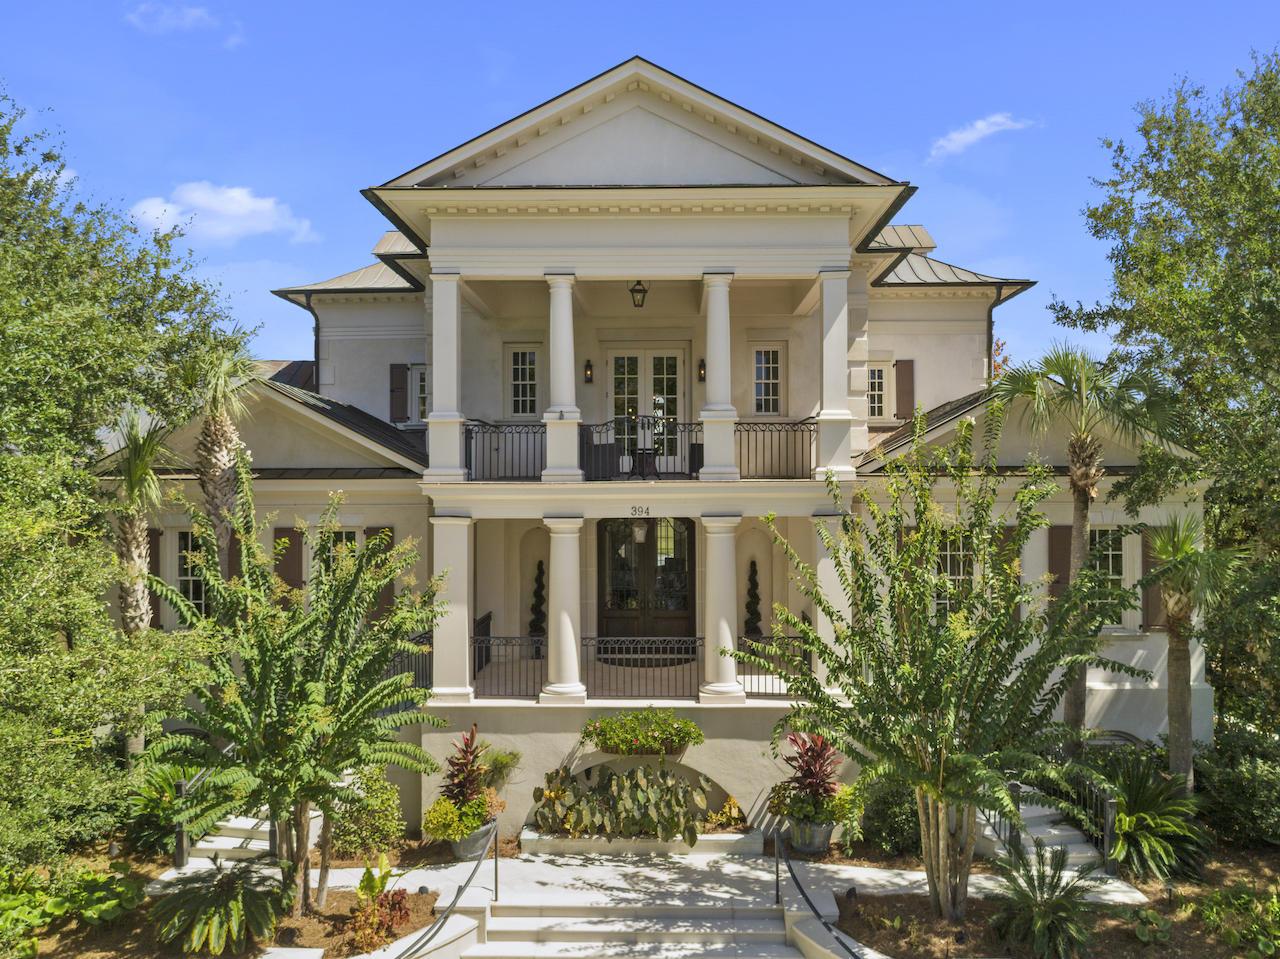 Daniel Island Homes For Sale - 394 Ralston Creek, Charleston, SC - 4